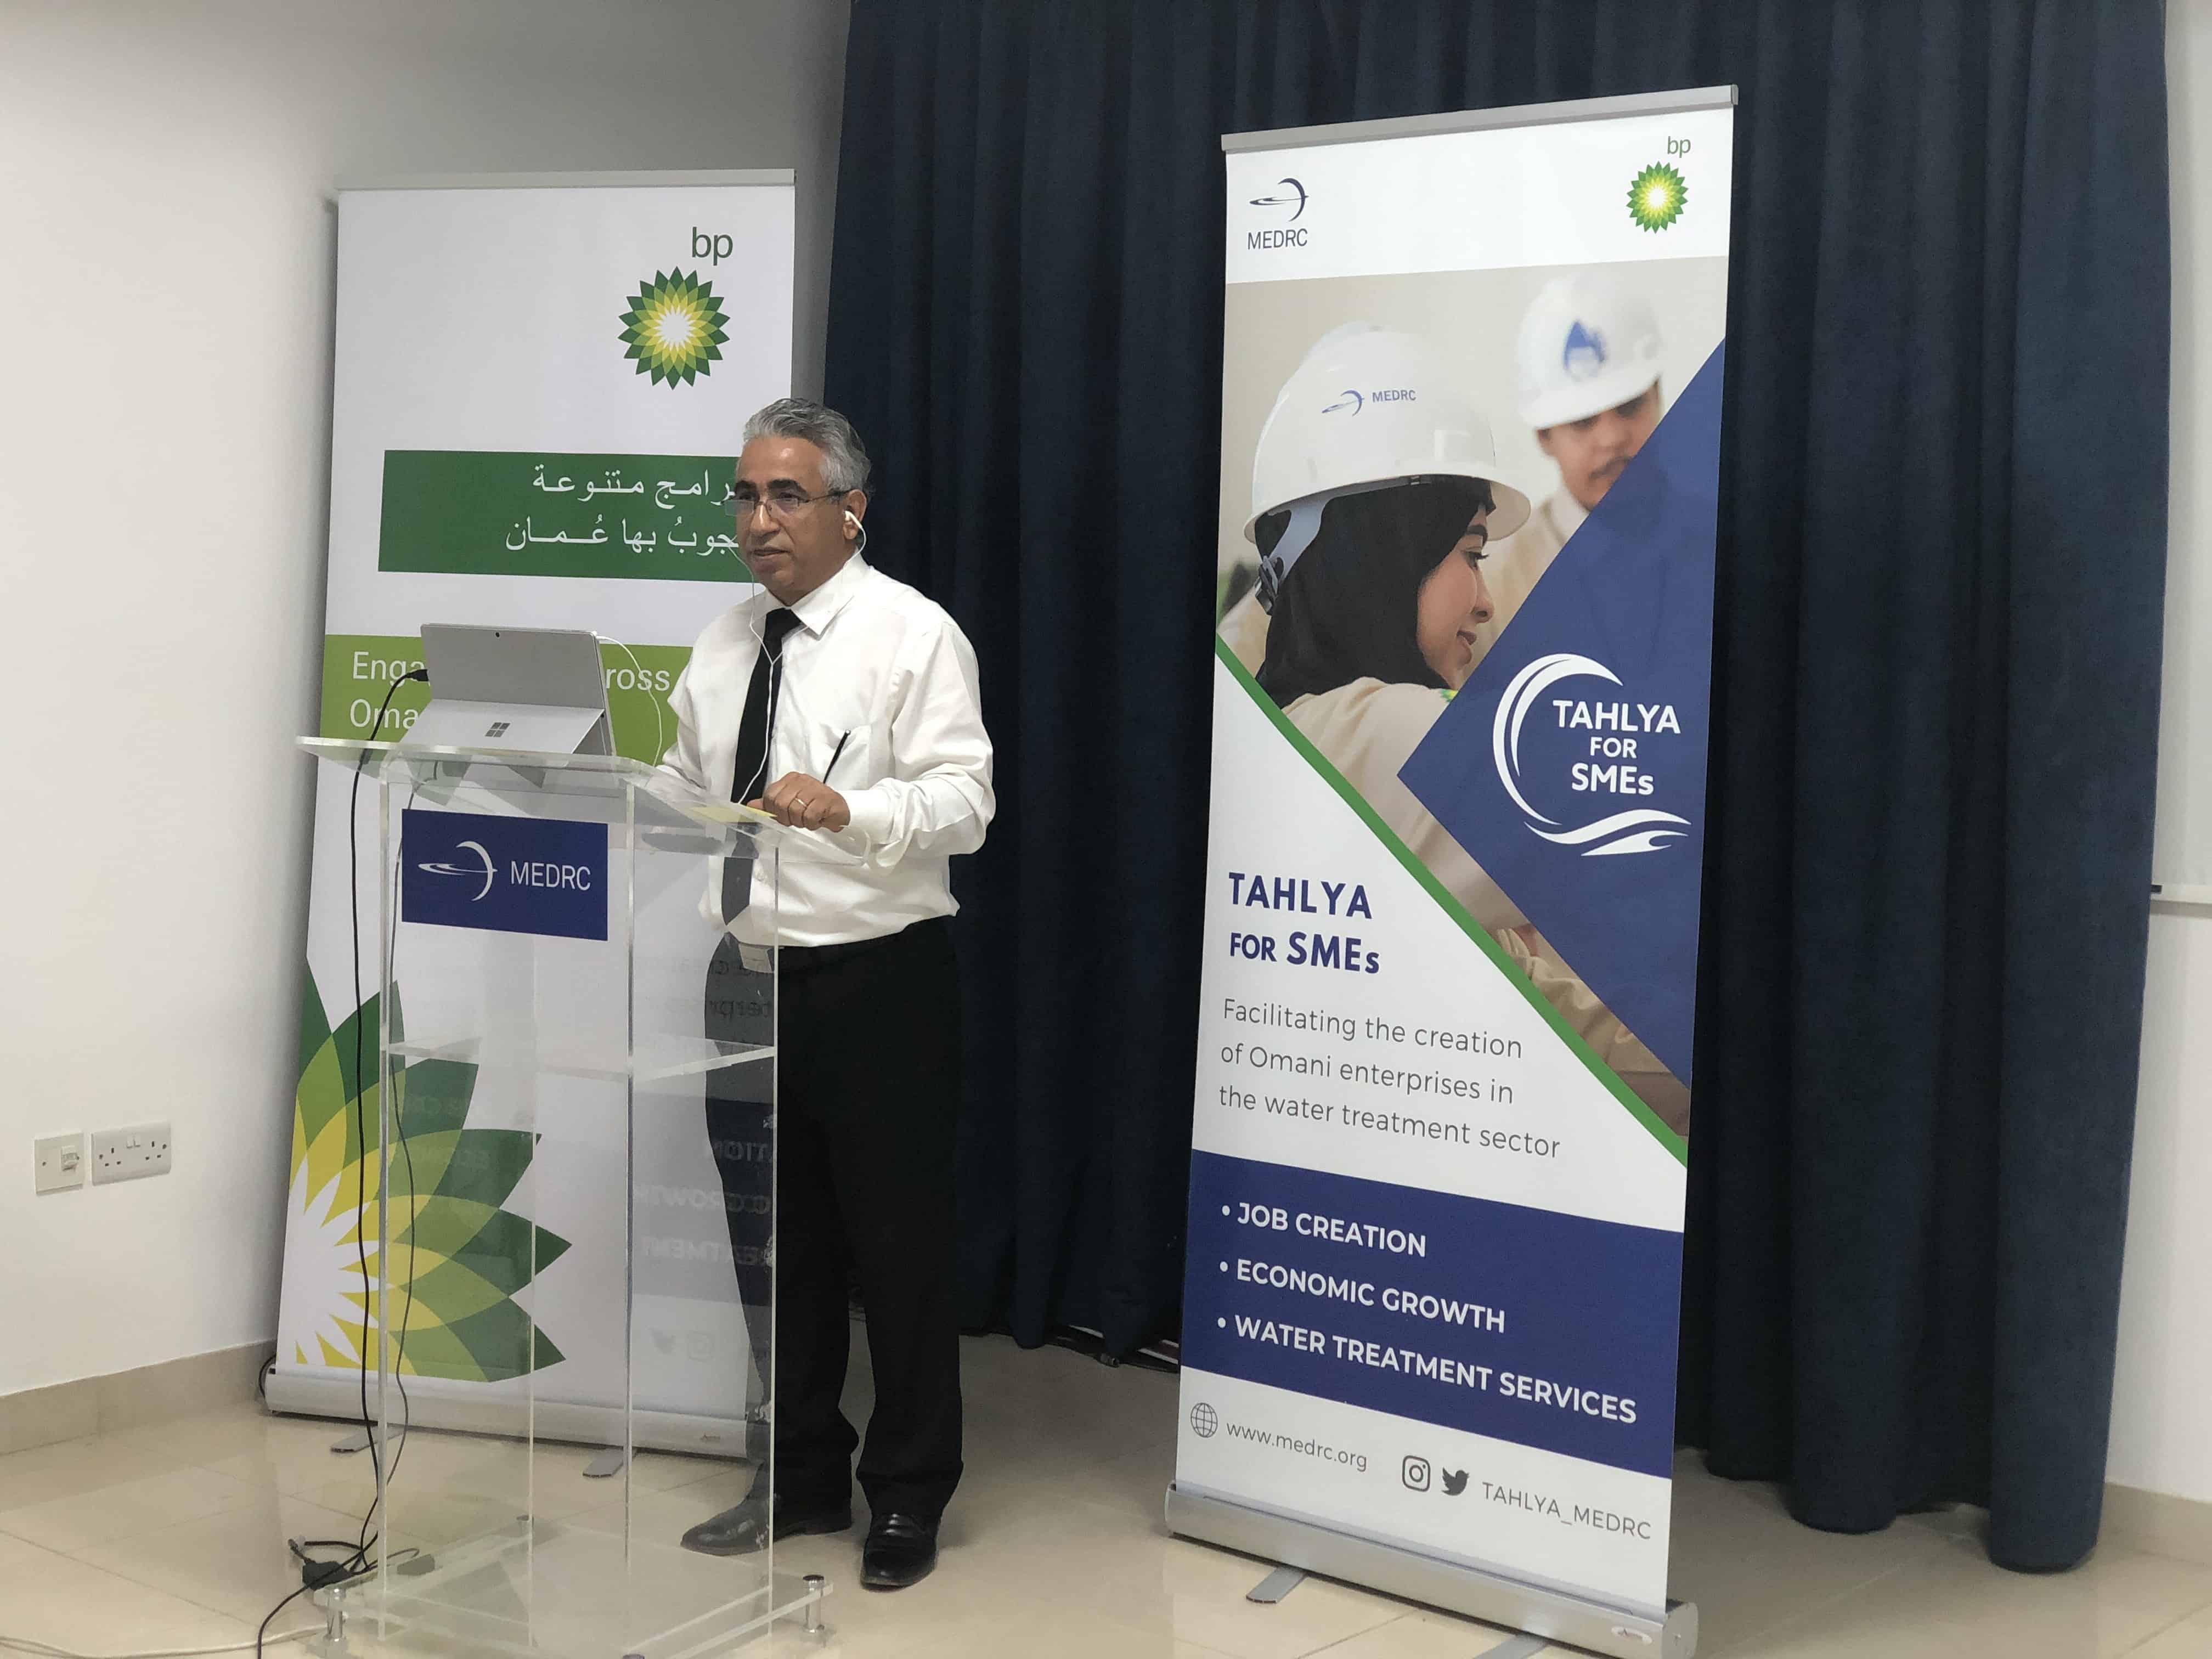 MEDRC Launch TAHLYA for SMEs